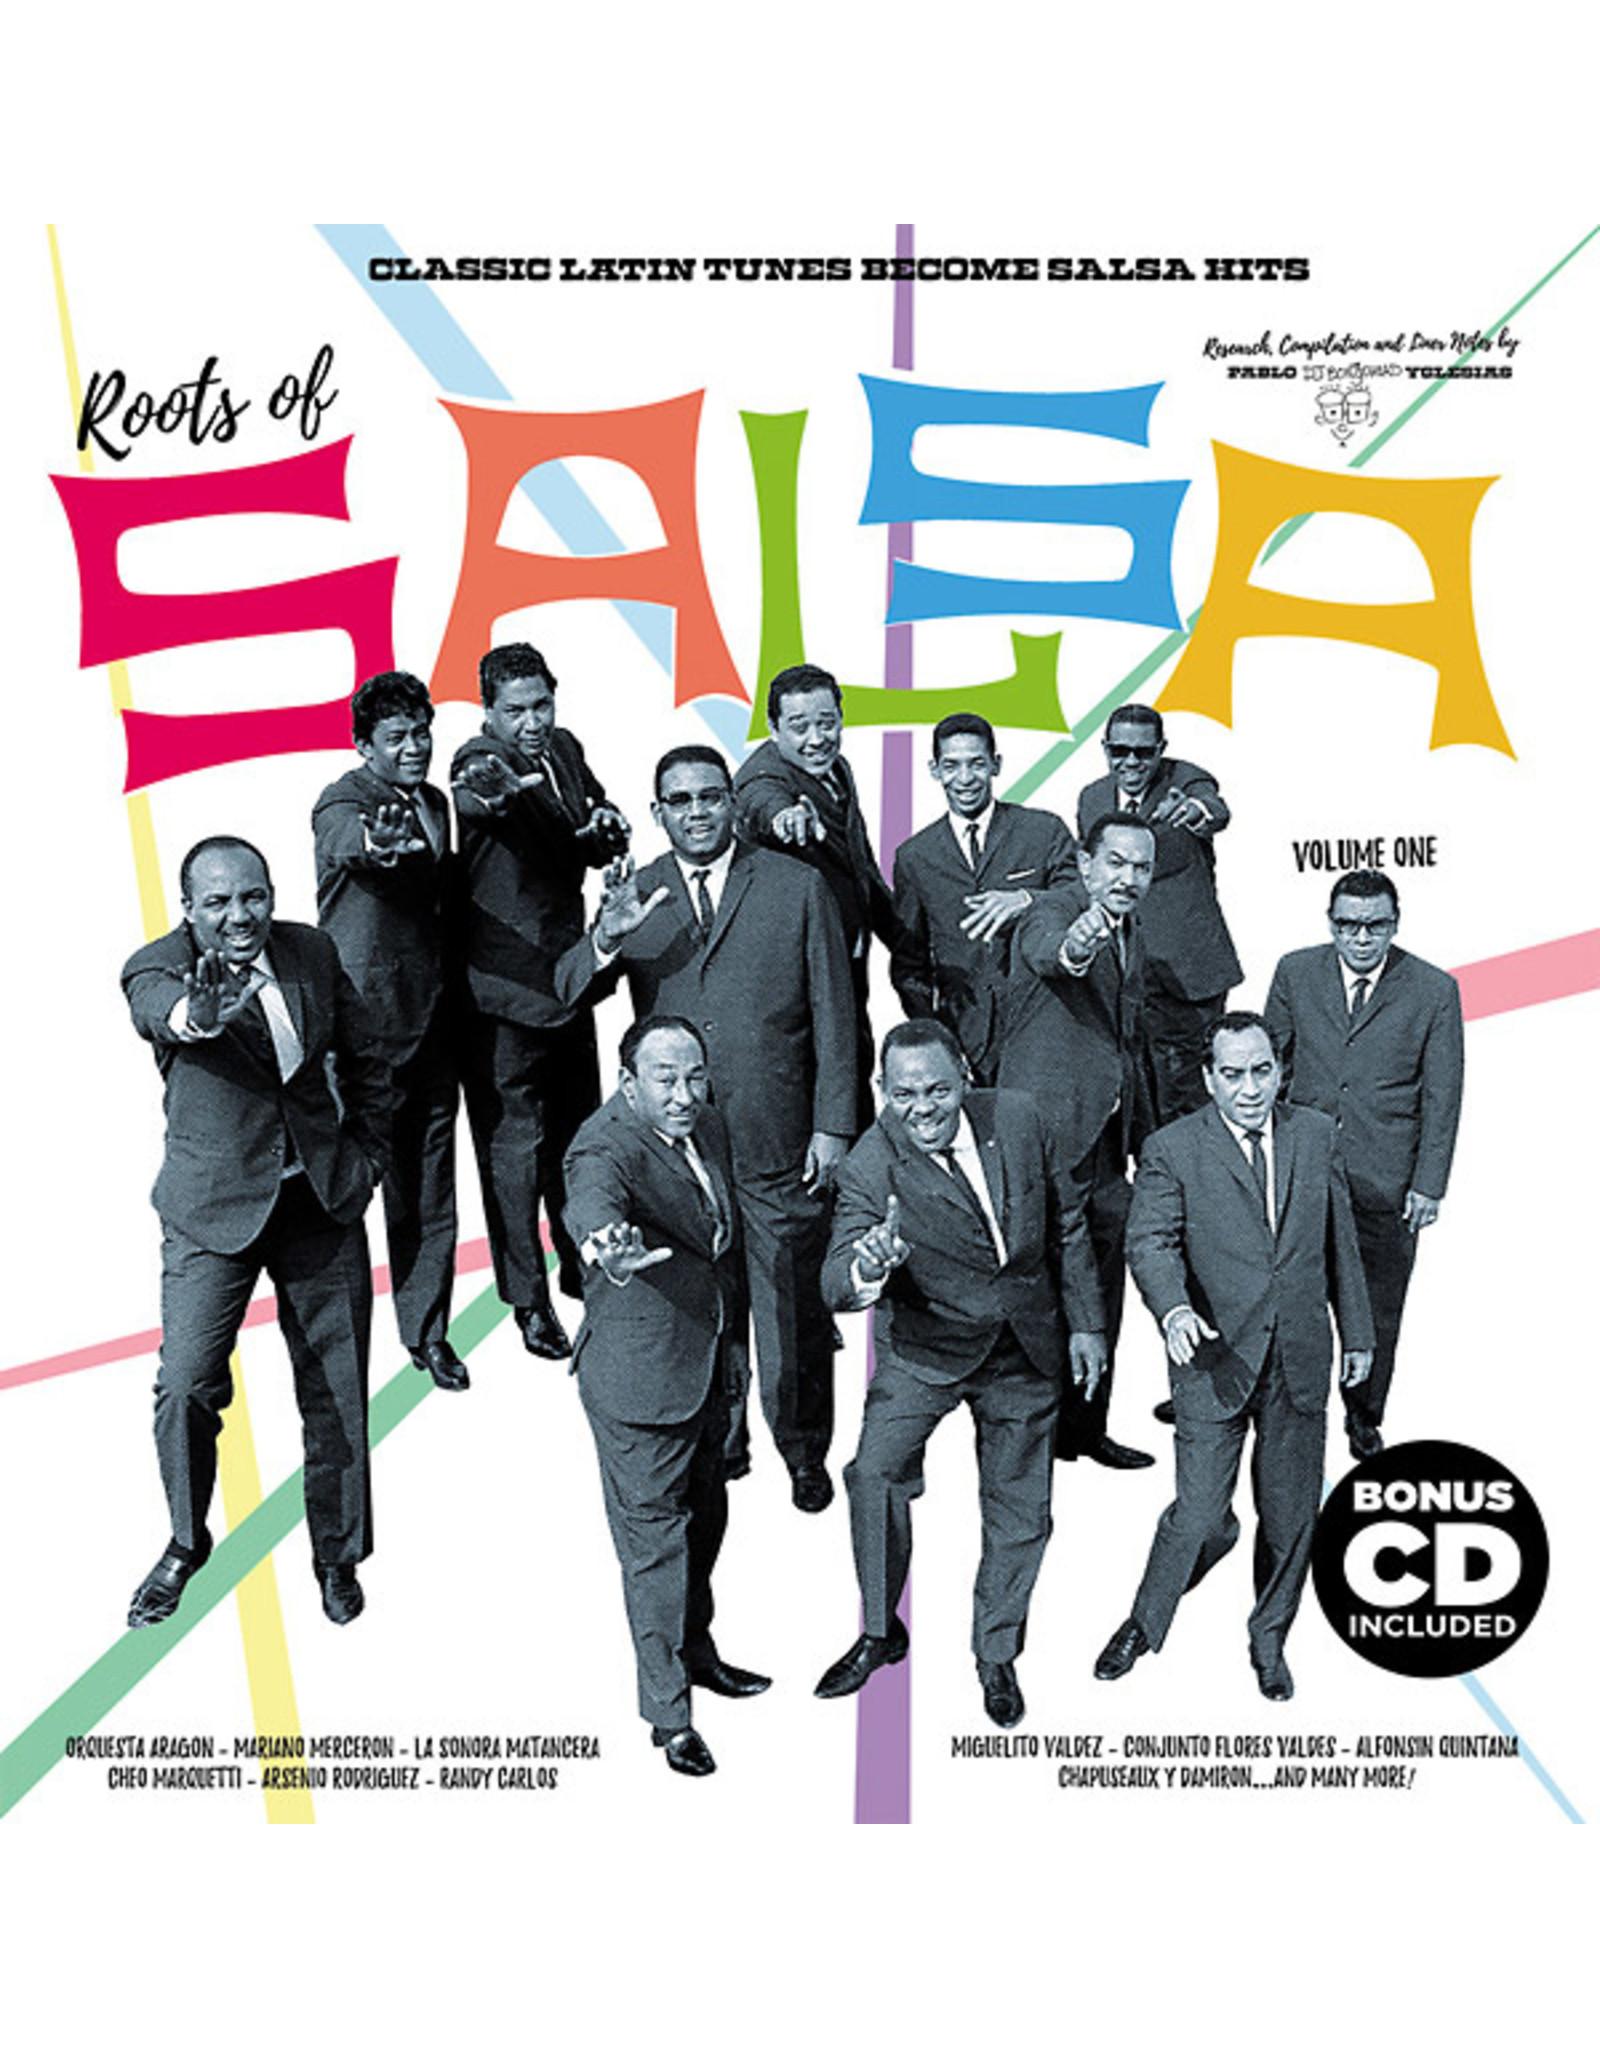 New Vinyl Various - Roots Of Salsa Vol. 1: Classic Latin Tunes Become Salsa Hits LP+CD